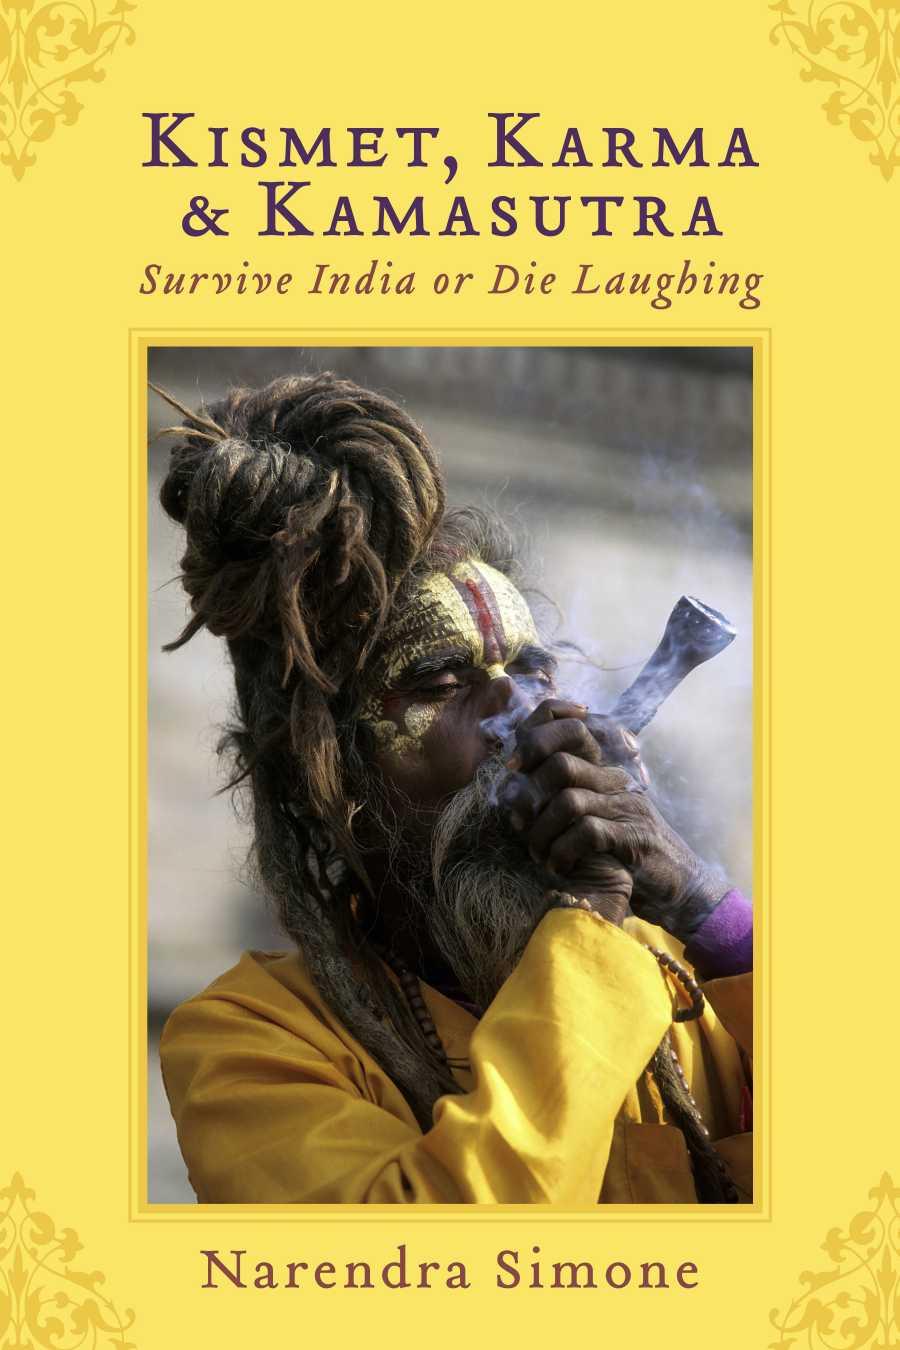 Kismet, Karma & Kamasutra - Short Stories - An Indian Misadventure